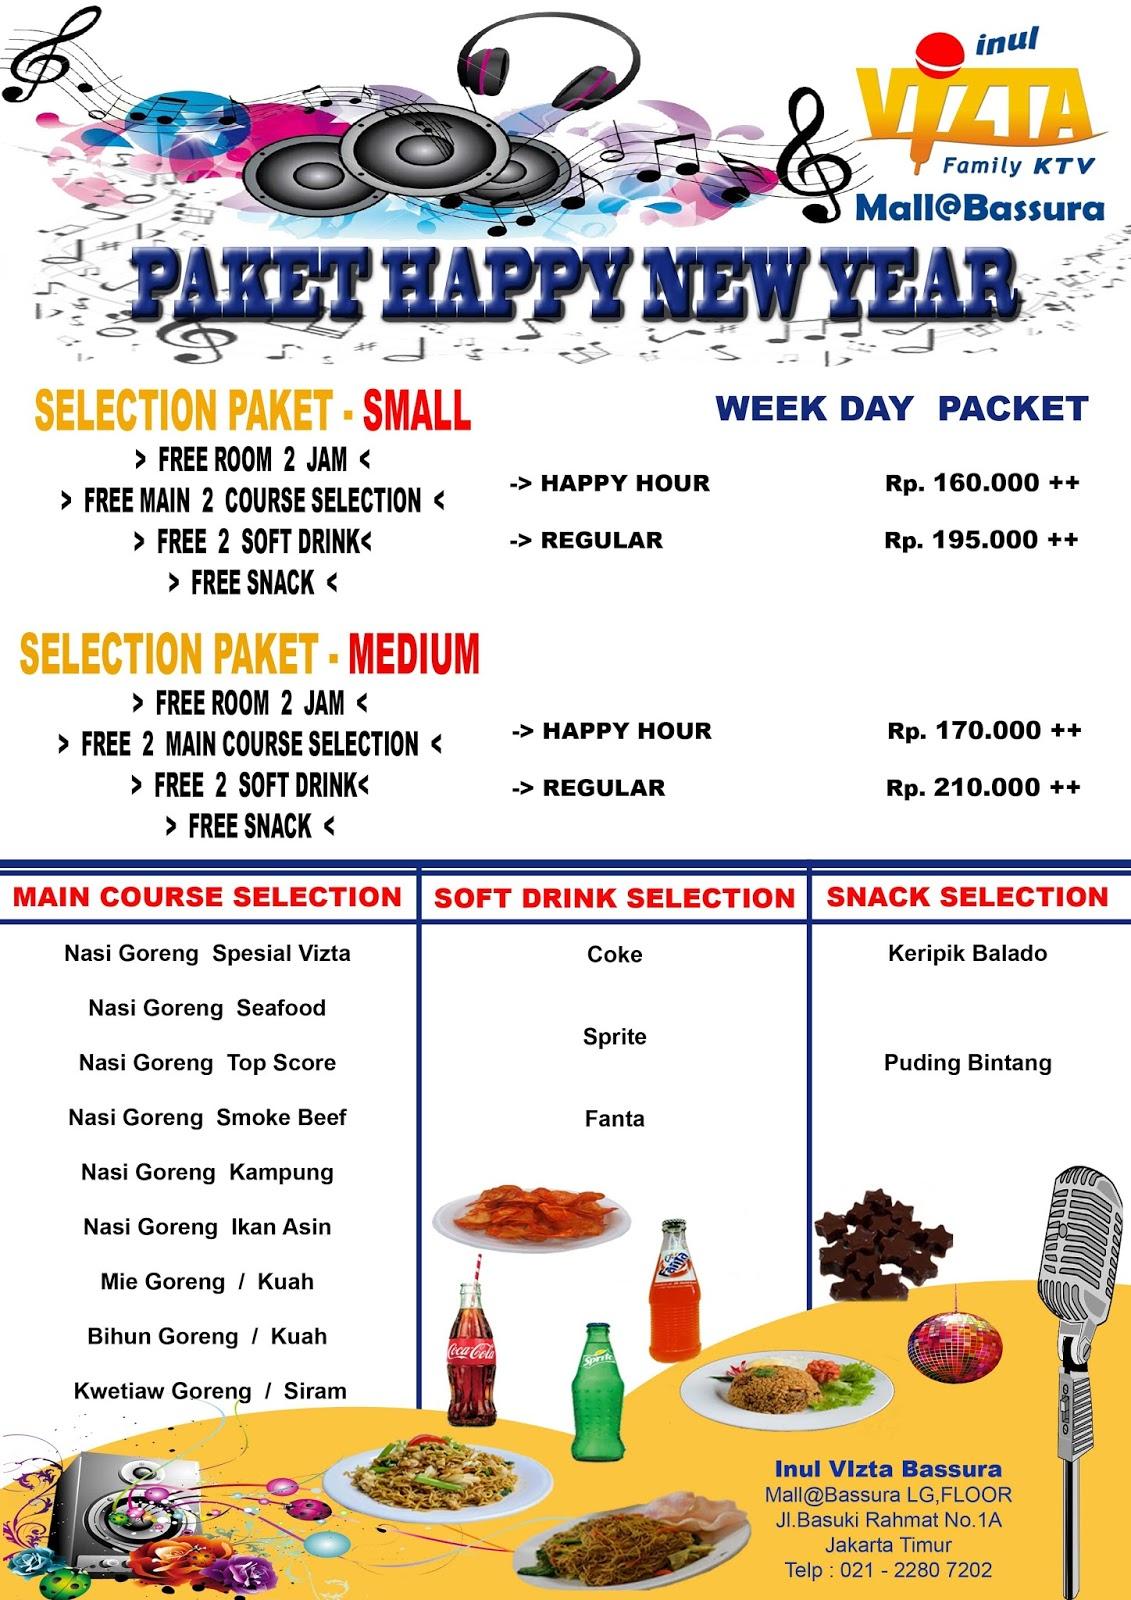 PAKET HAPPY NEW YEAR INUL VIZTA MALL@BASSURA WEEK DAY, PAKET HAPPY NEW YEAR INUL VIZTA BASSURA WEEK DAY